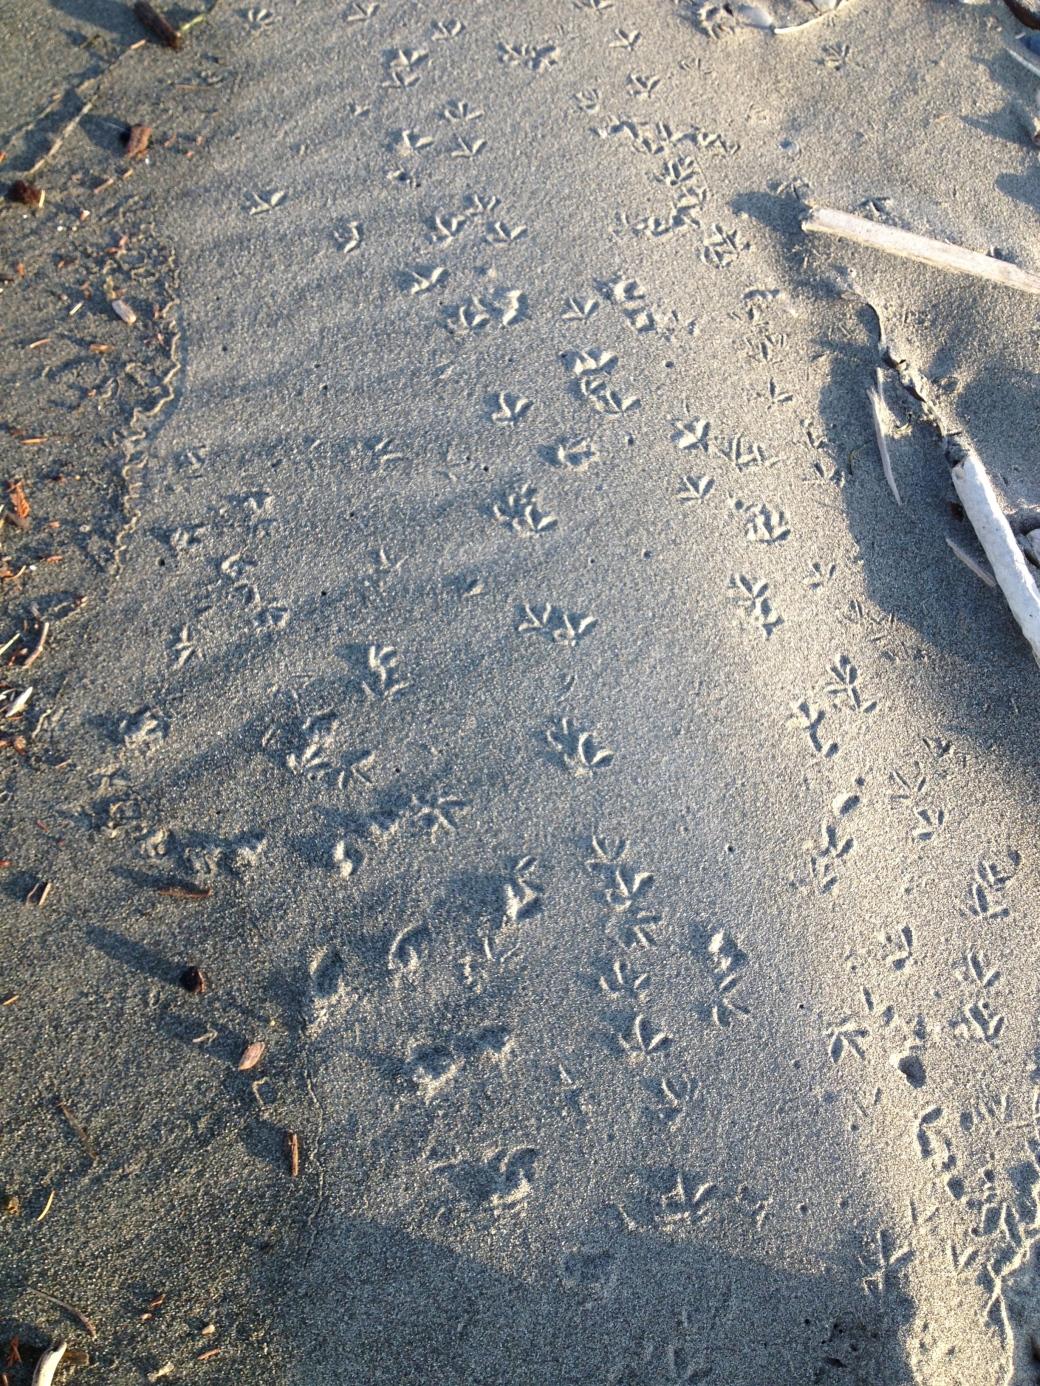 Bird tracks on the Spit